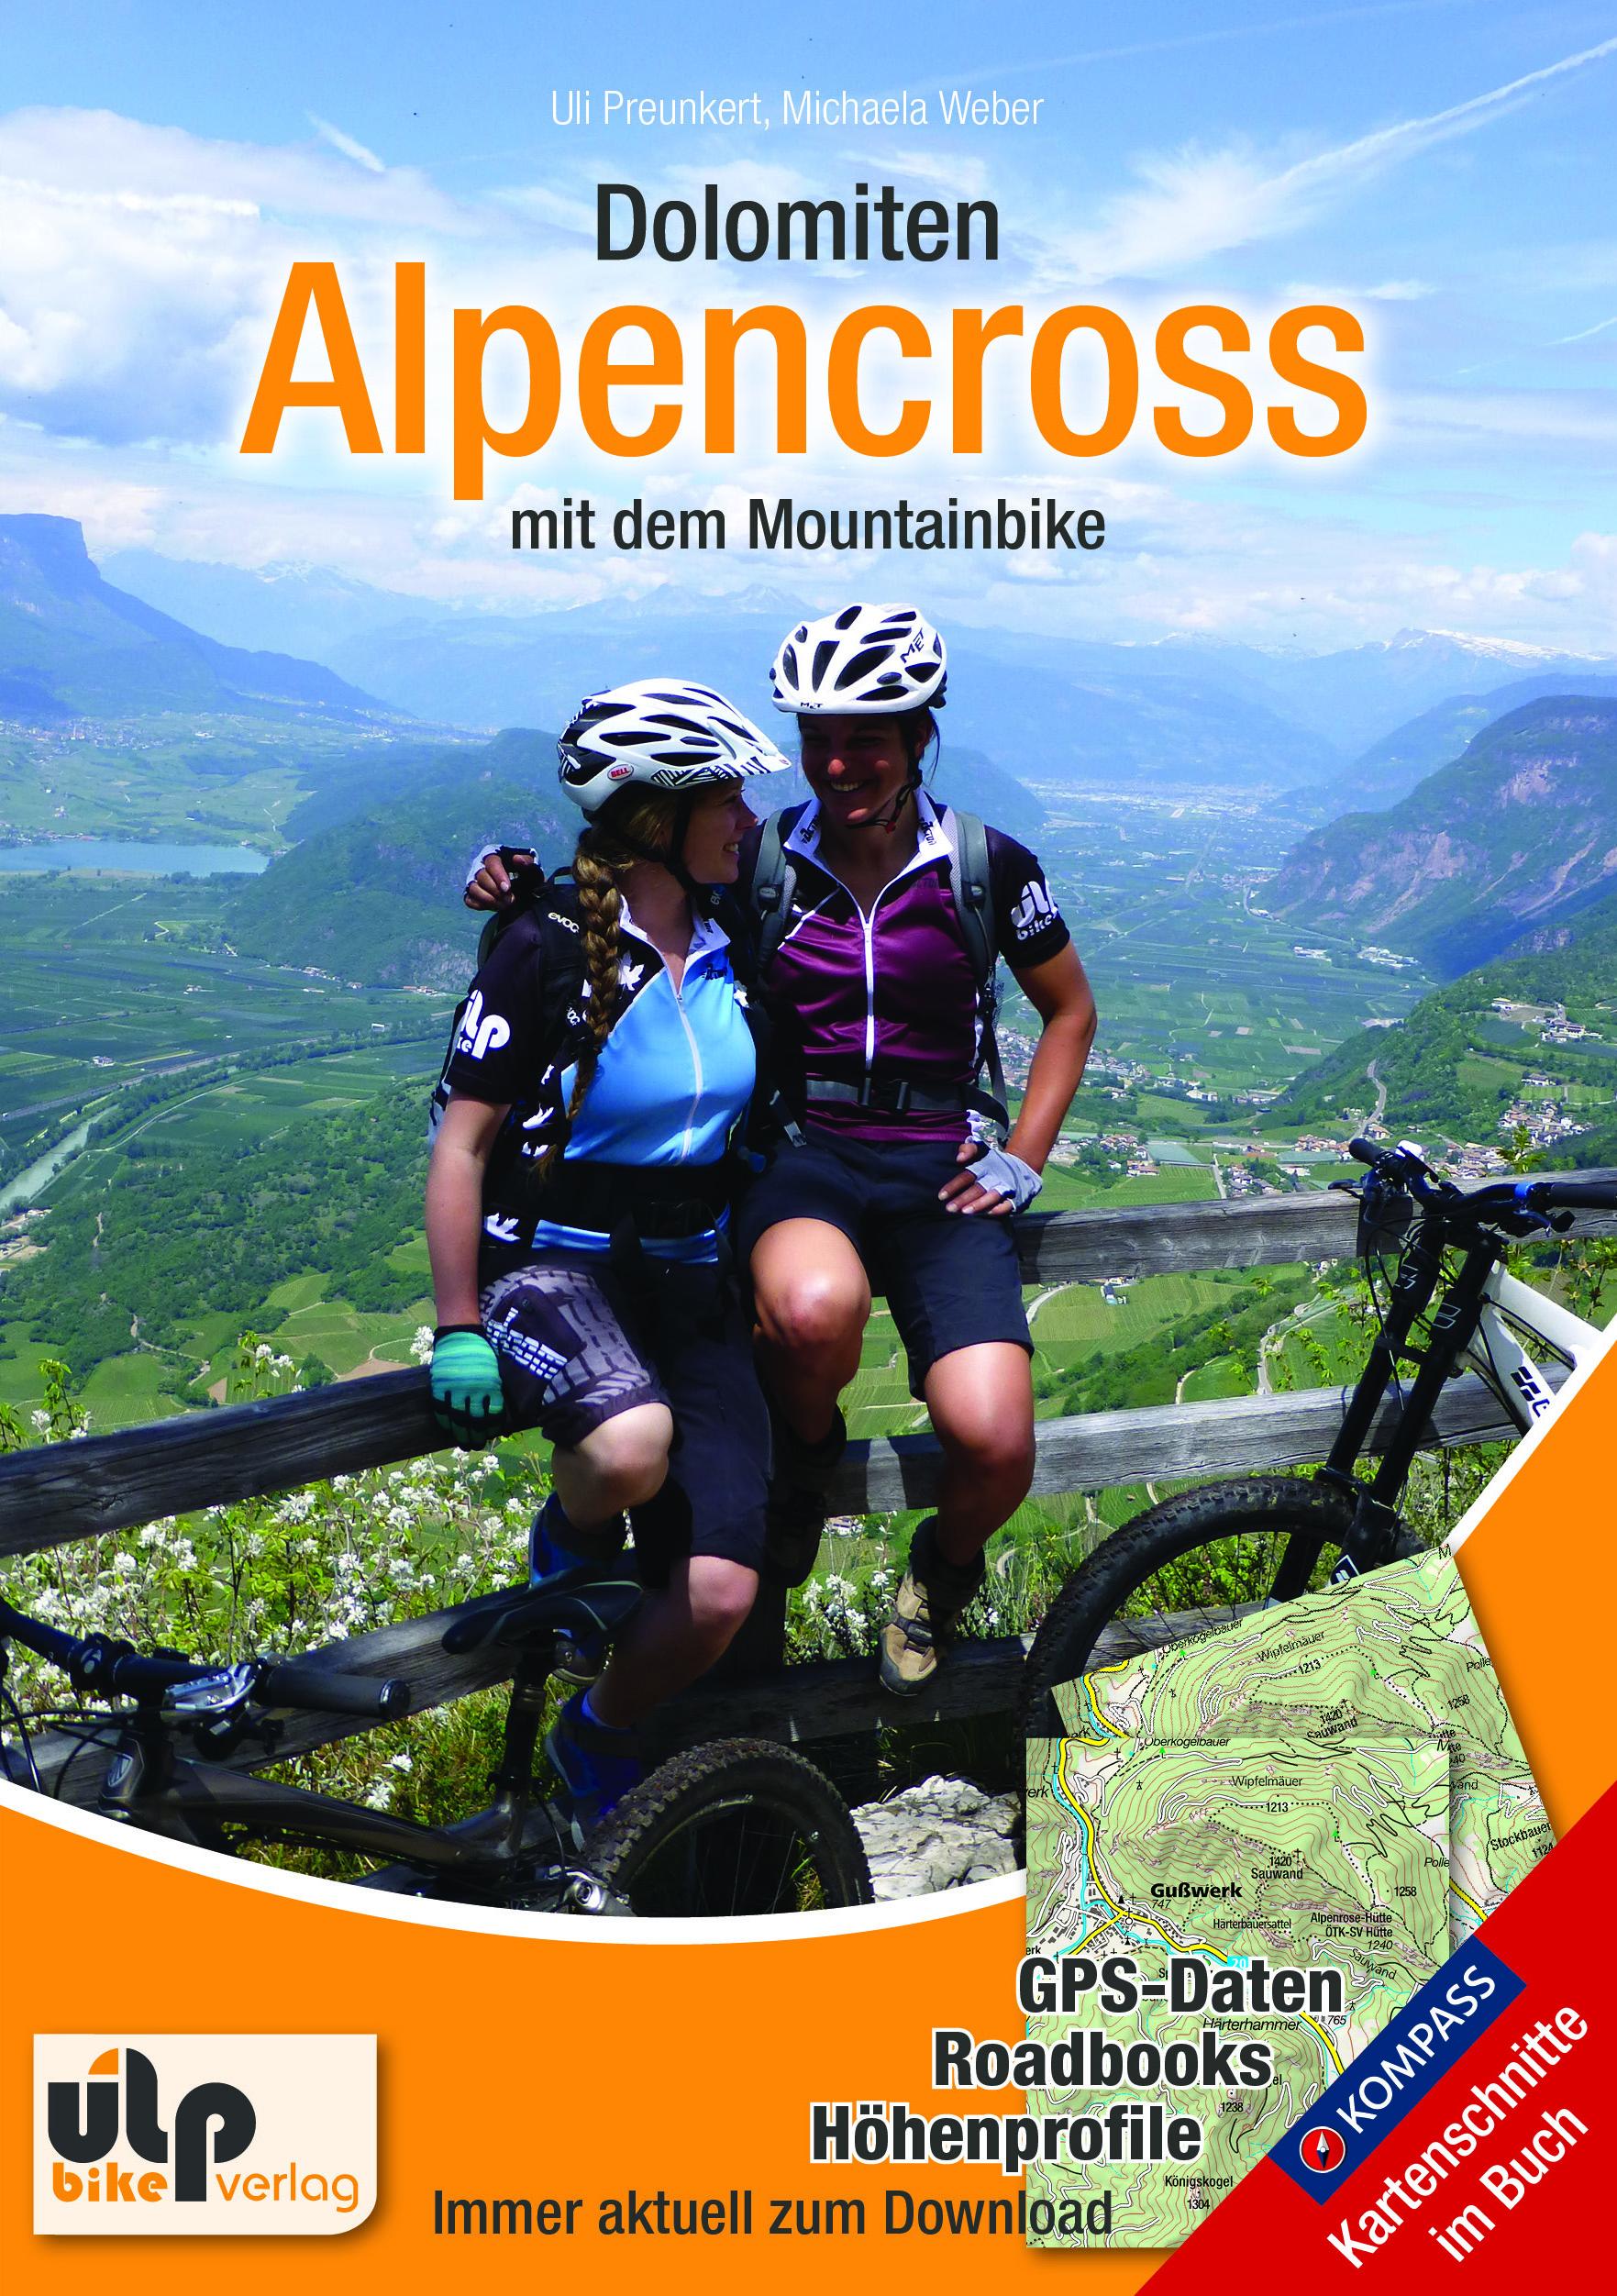 ulpbike shop dolomiten alpencross mit dem mountainbike. Black Bedroom Furniture Sets. Home Design Ideas